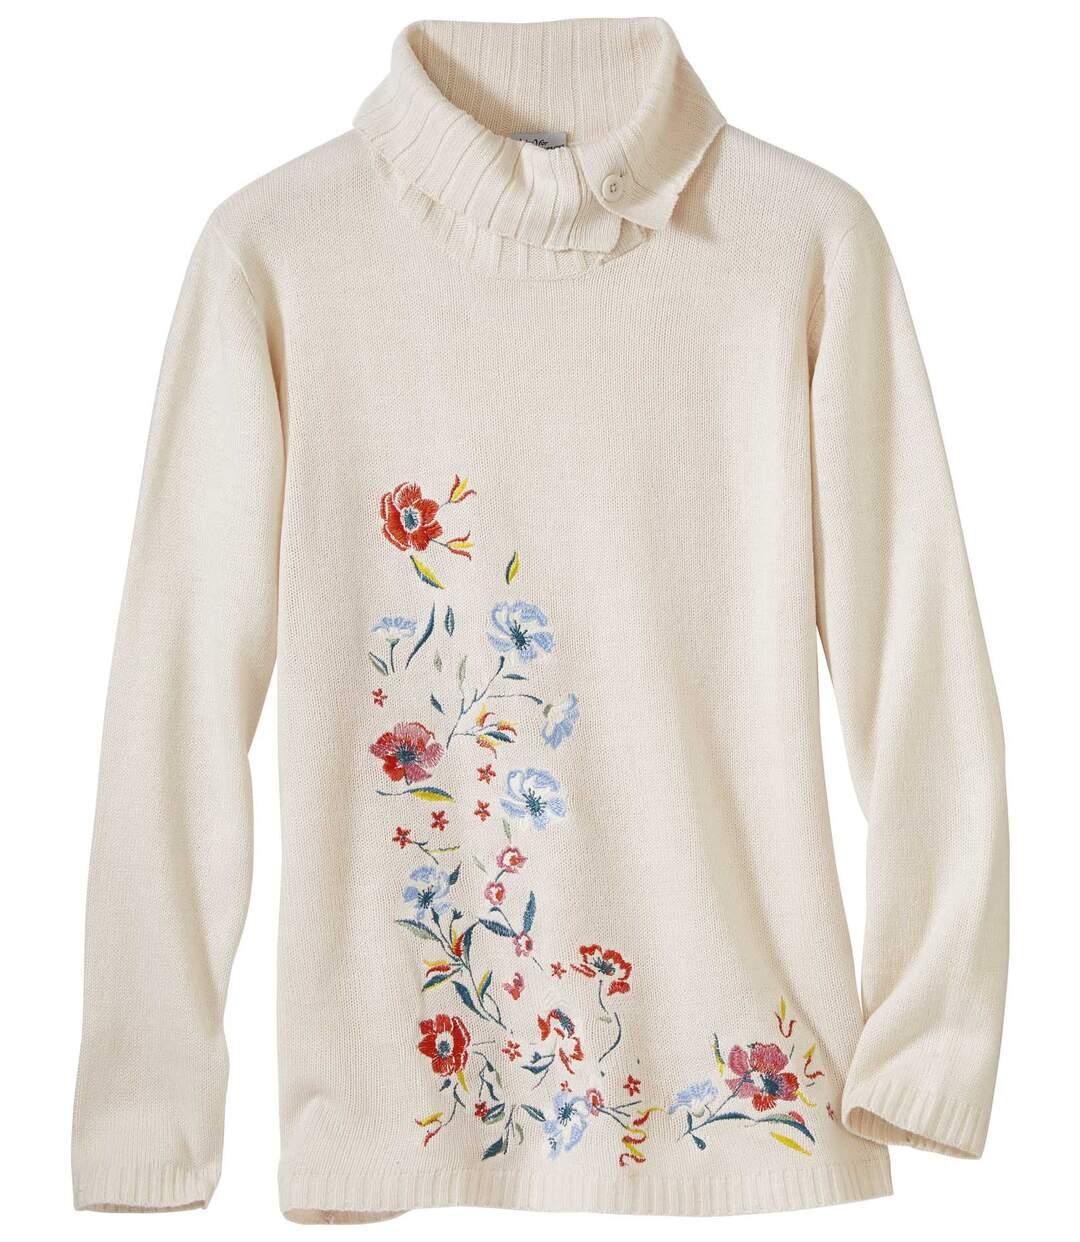 Pullover Herbstblüten im Tunika-Stil